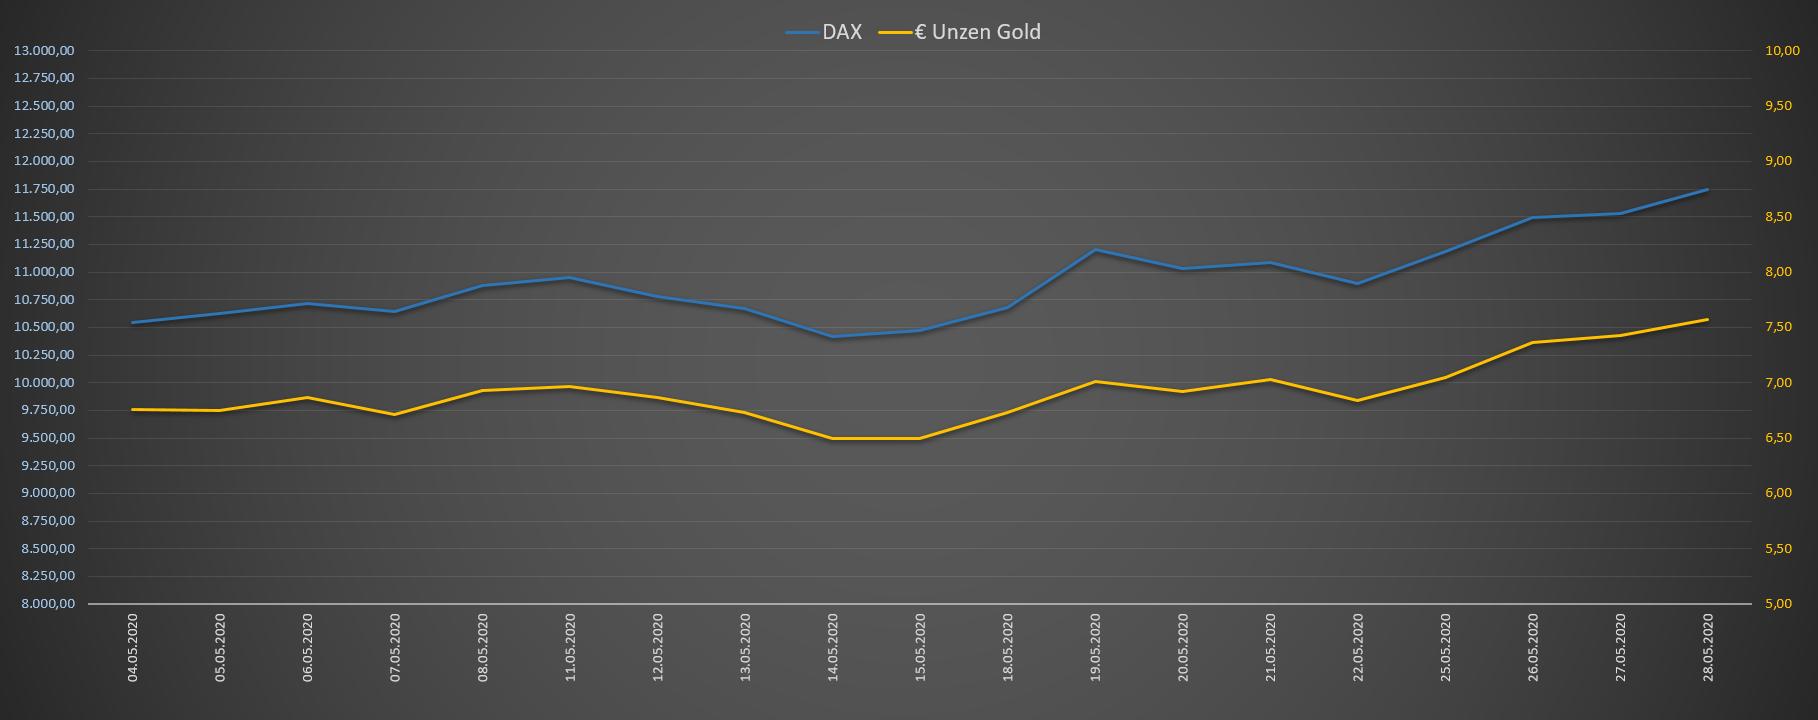 DAX Bewertung in Unzen Gold in Euro - Chart 1 Monat